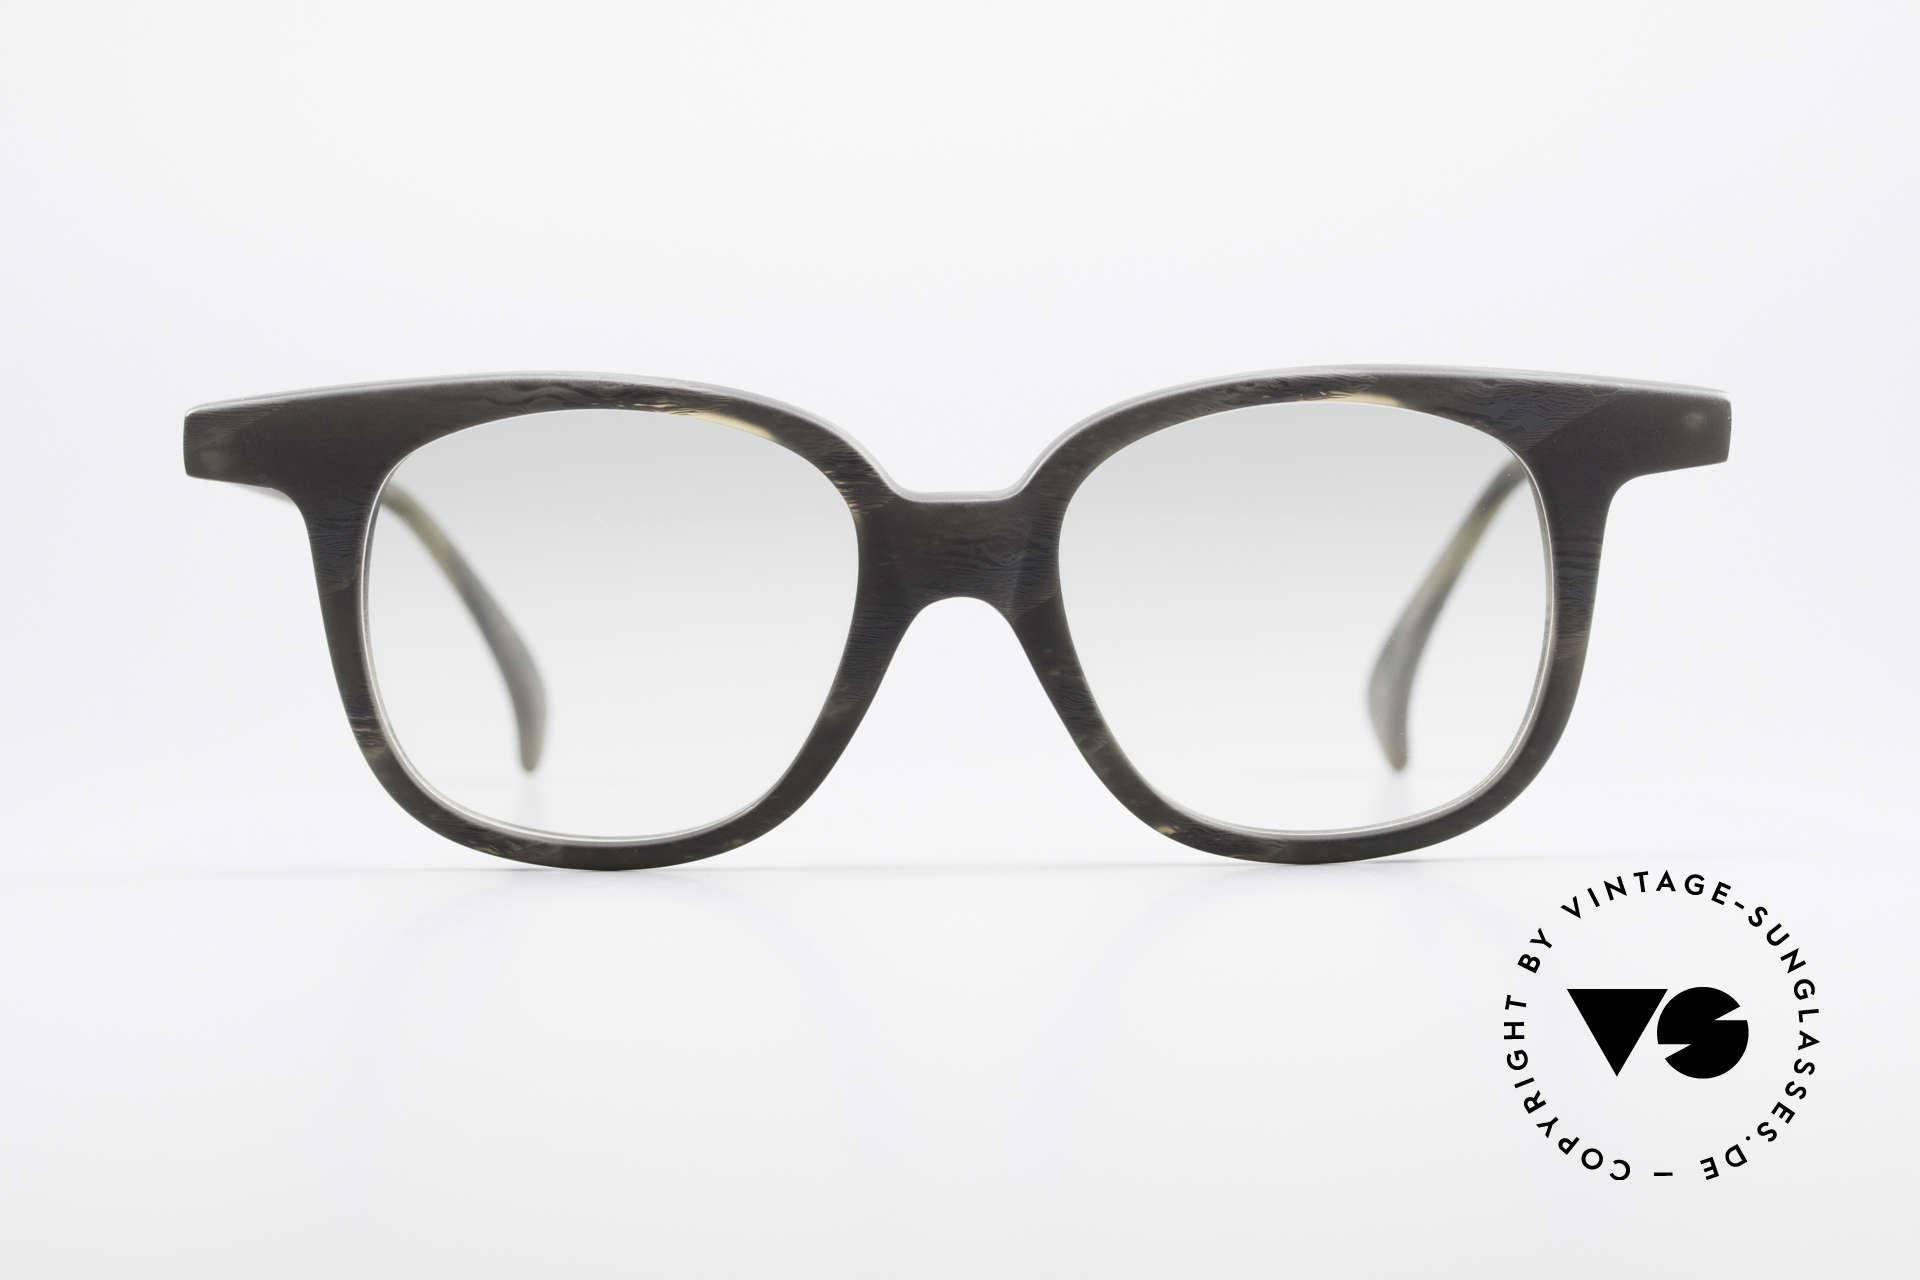 Alain Mikli 919 / 450 Square Panto Sunglasses, extraordinary 'square panto' design, UNIQUE!, Made for Men and Women